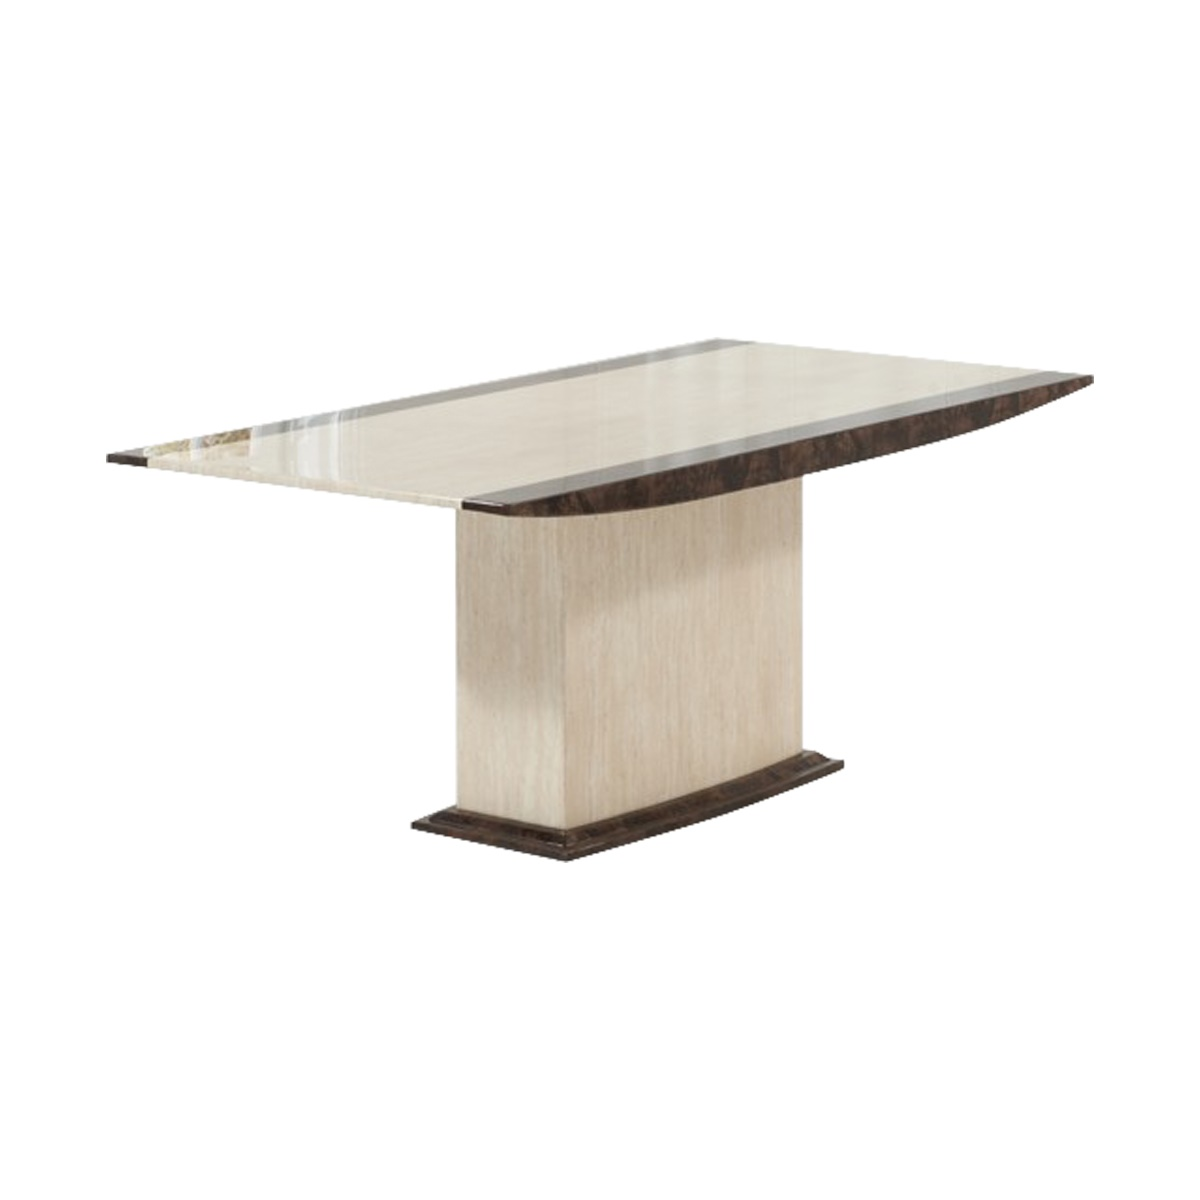 Monaco Cream & Brown Marble Dining Table